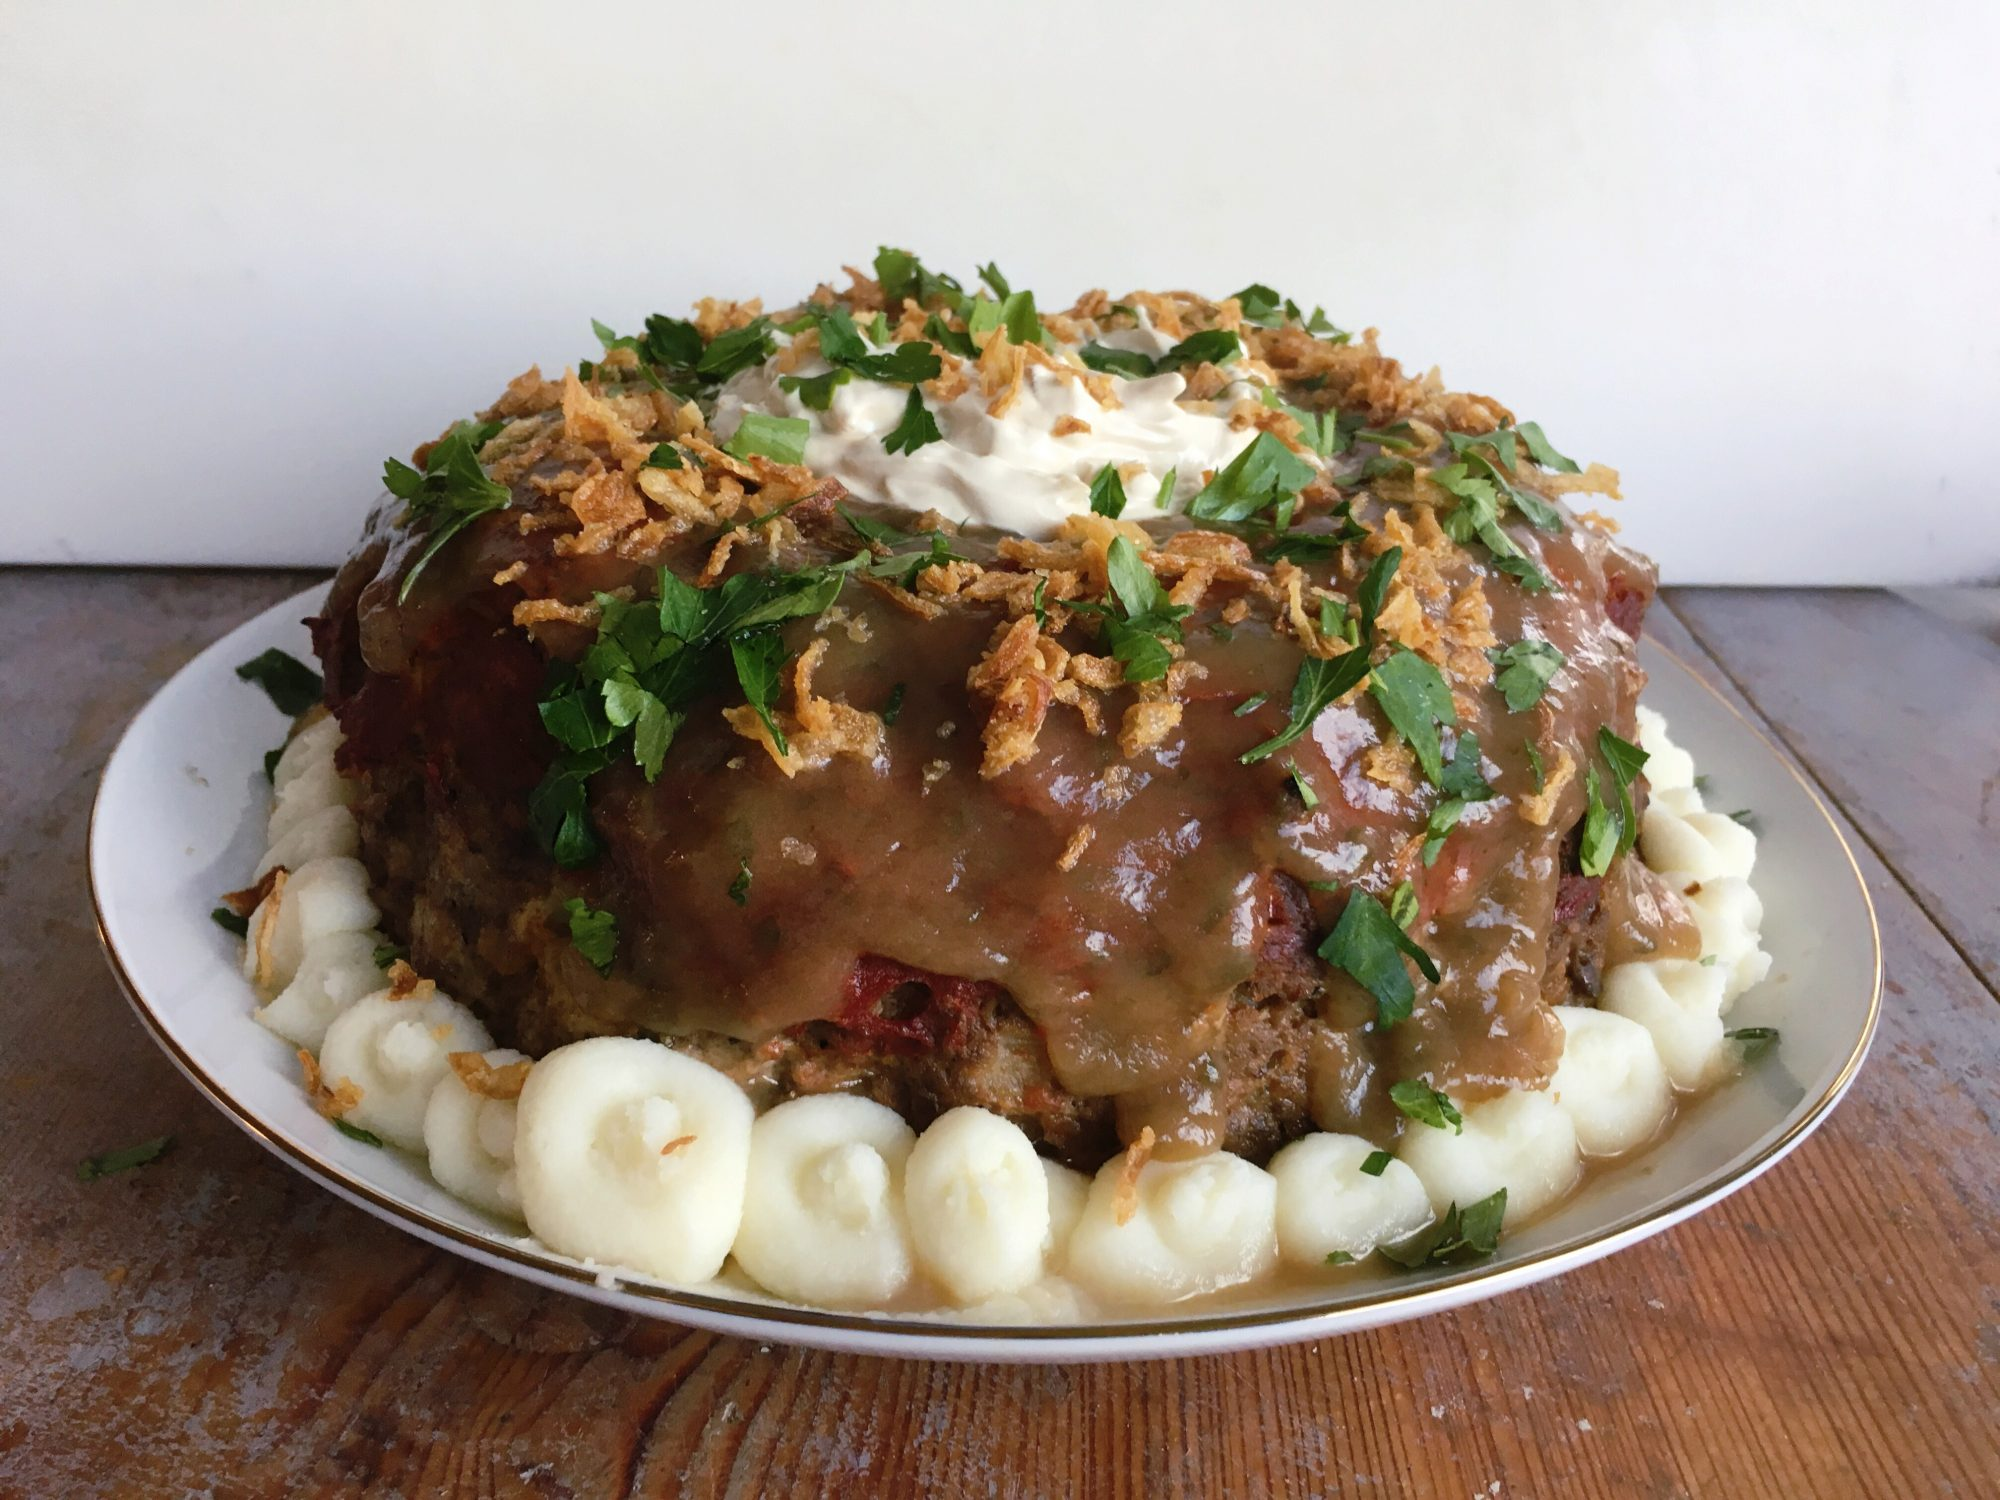 beef-week-meatloaf-bundt-cake-2